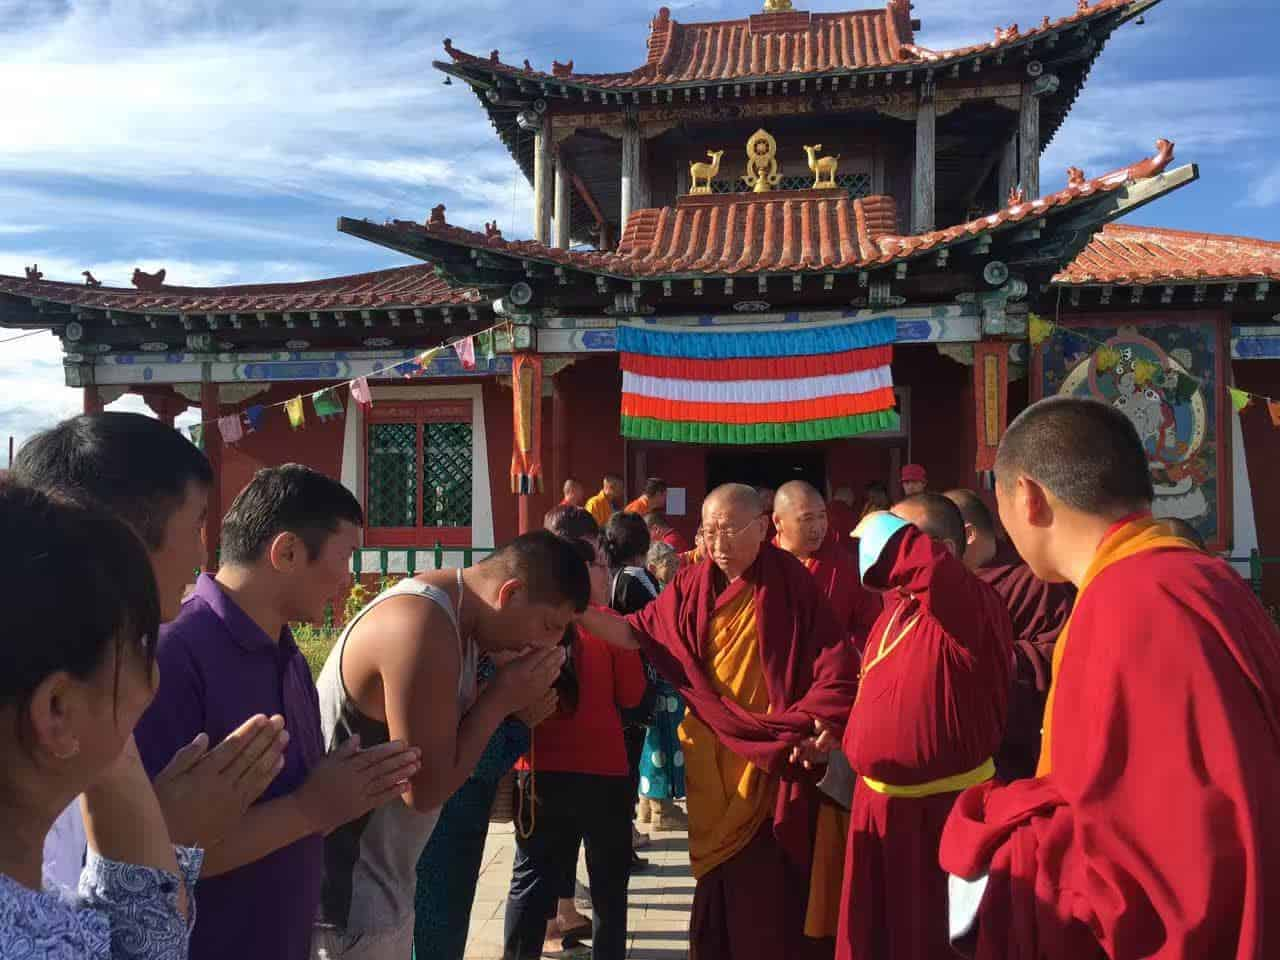 gosok-rinpoche-mongolia-2016-7008bf6de0cfcaf5ee13706f9973e4a